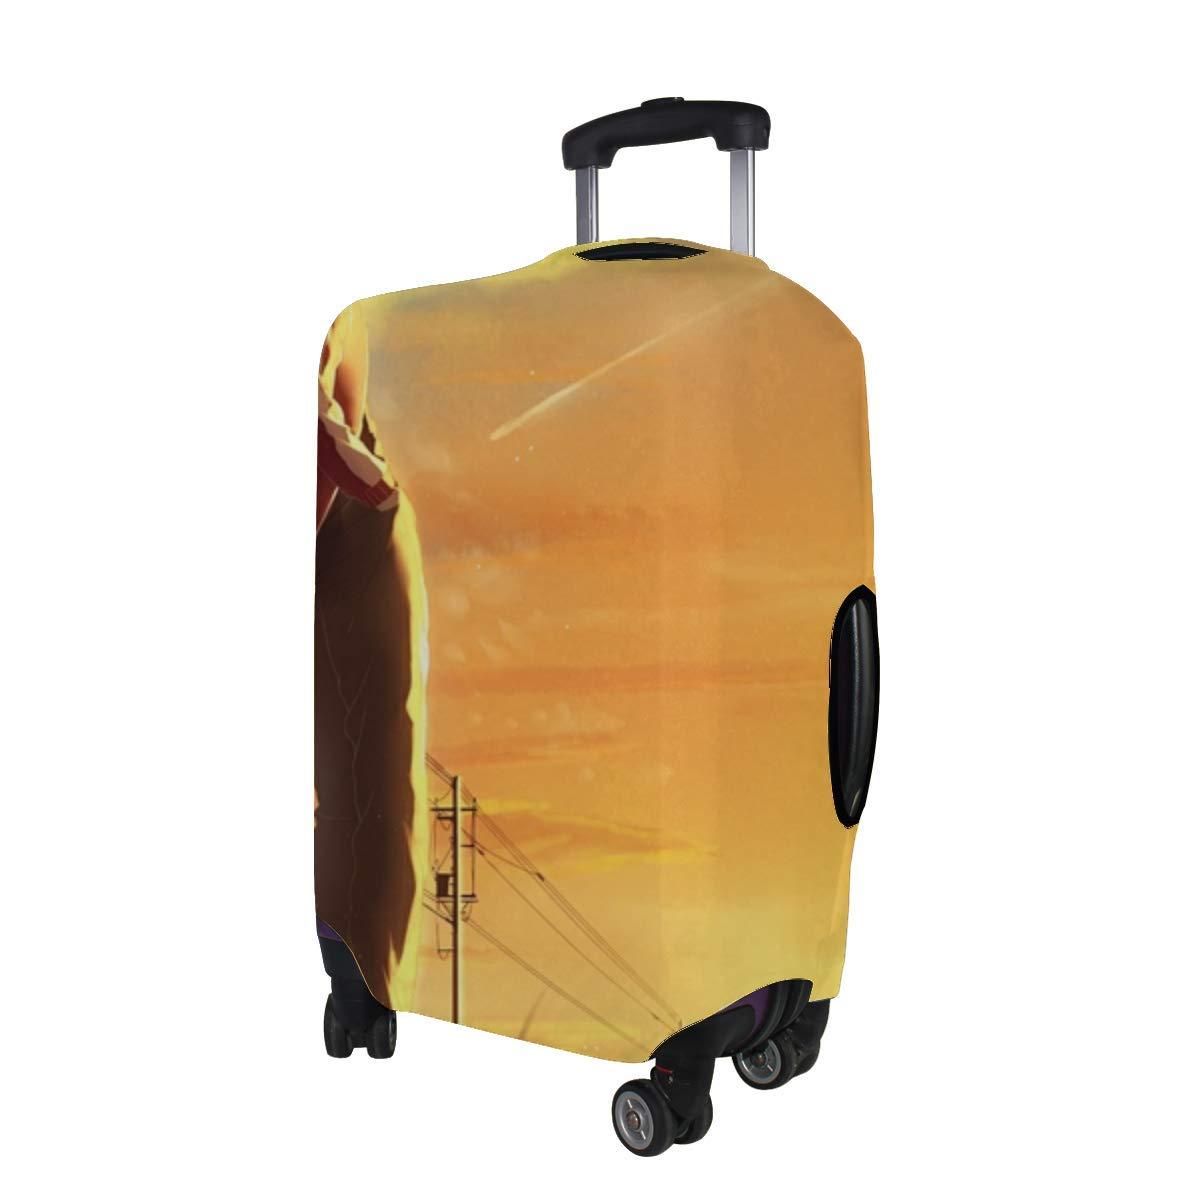 Maxm Kagerou Project Kisaragi Shintaro Tateyama Ayano Pattern Print Travel Luggage Protector Baggage Suitcase Cover Fits 18-21 Inch Luggage